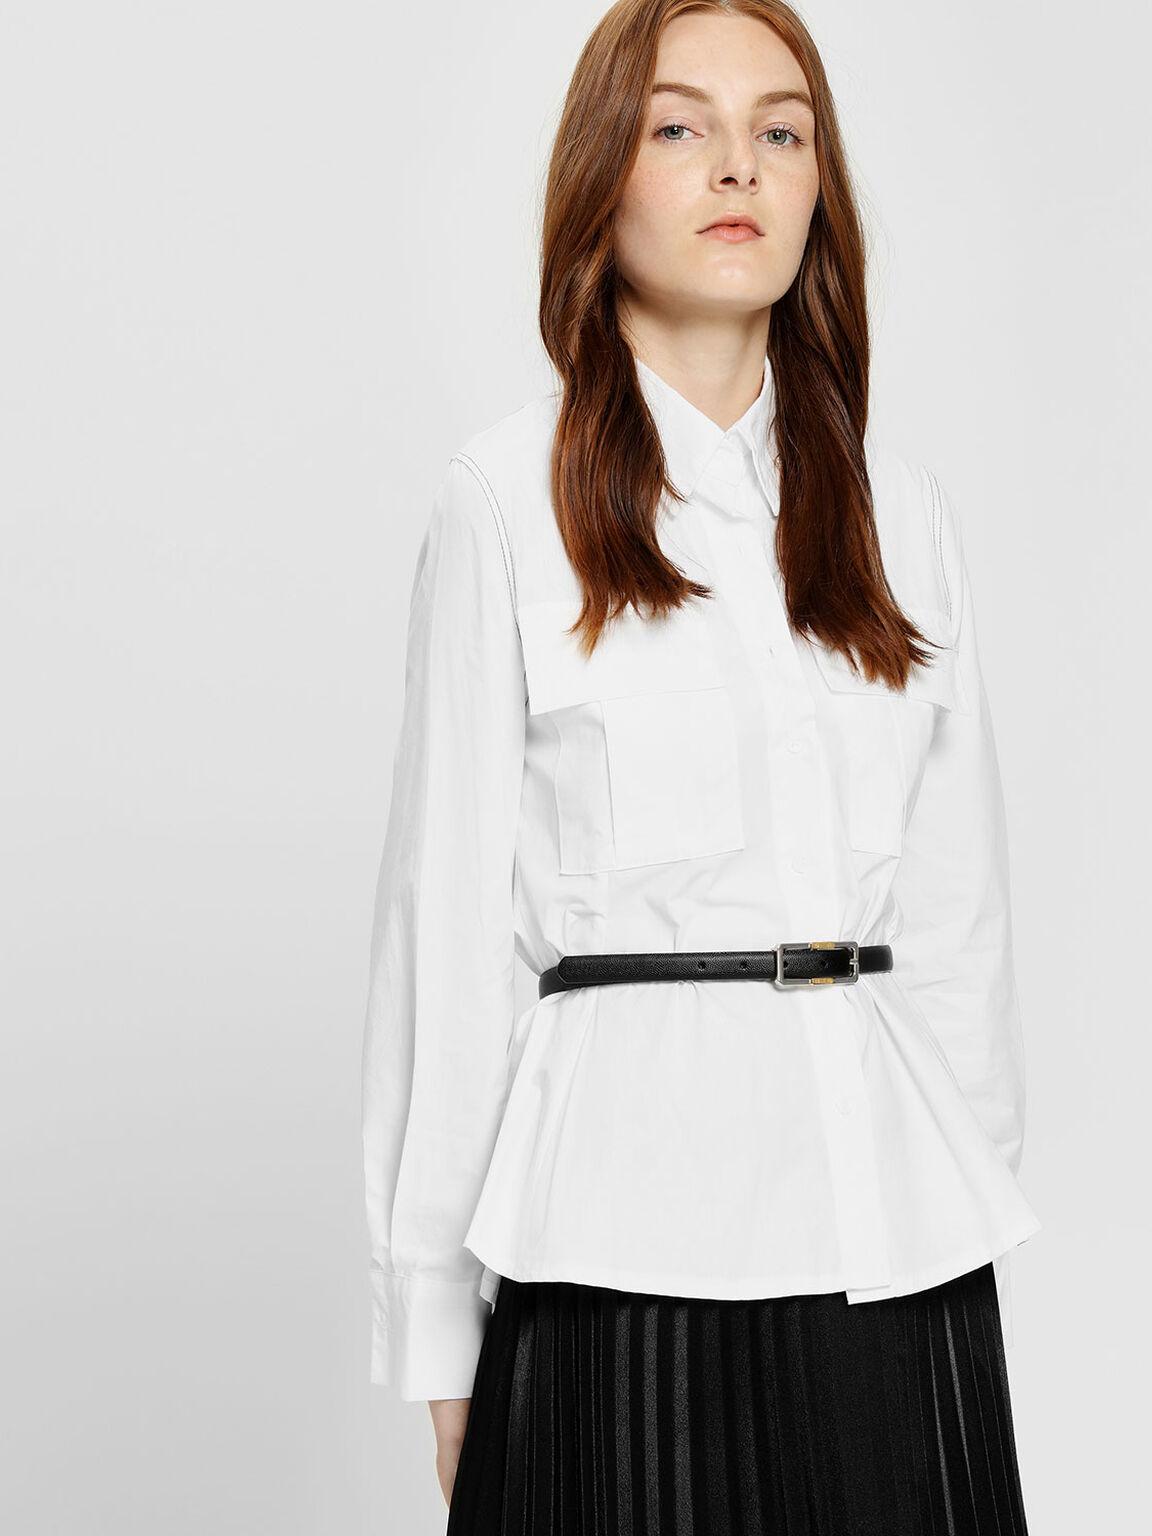 Reversible Thin Belt, Black, hi-res